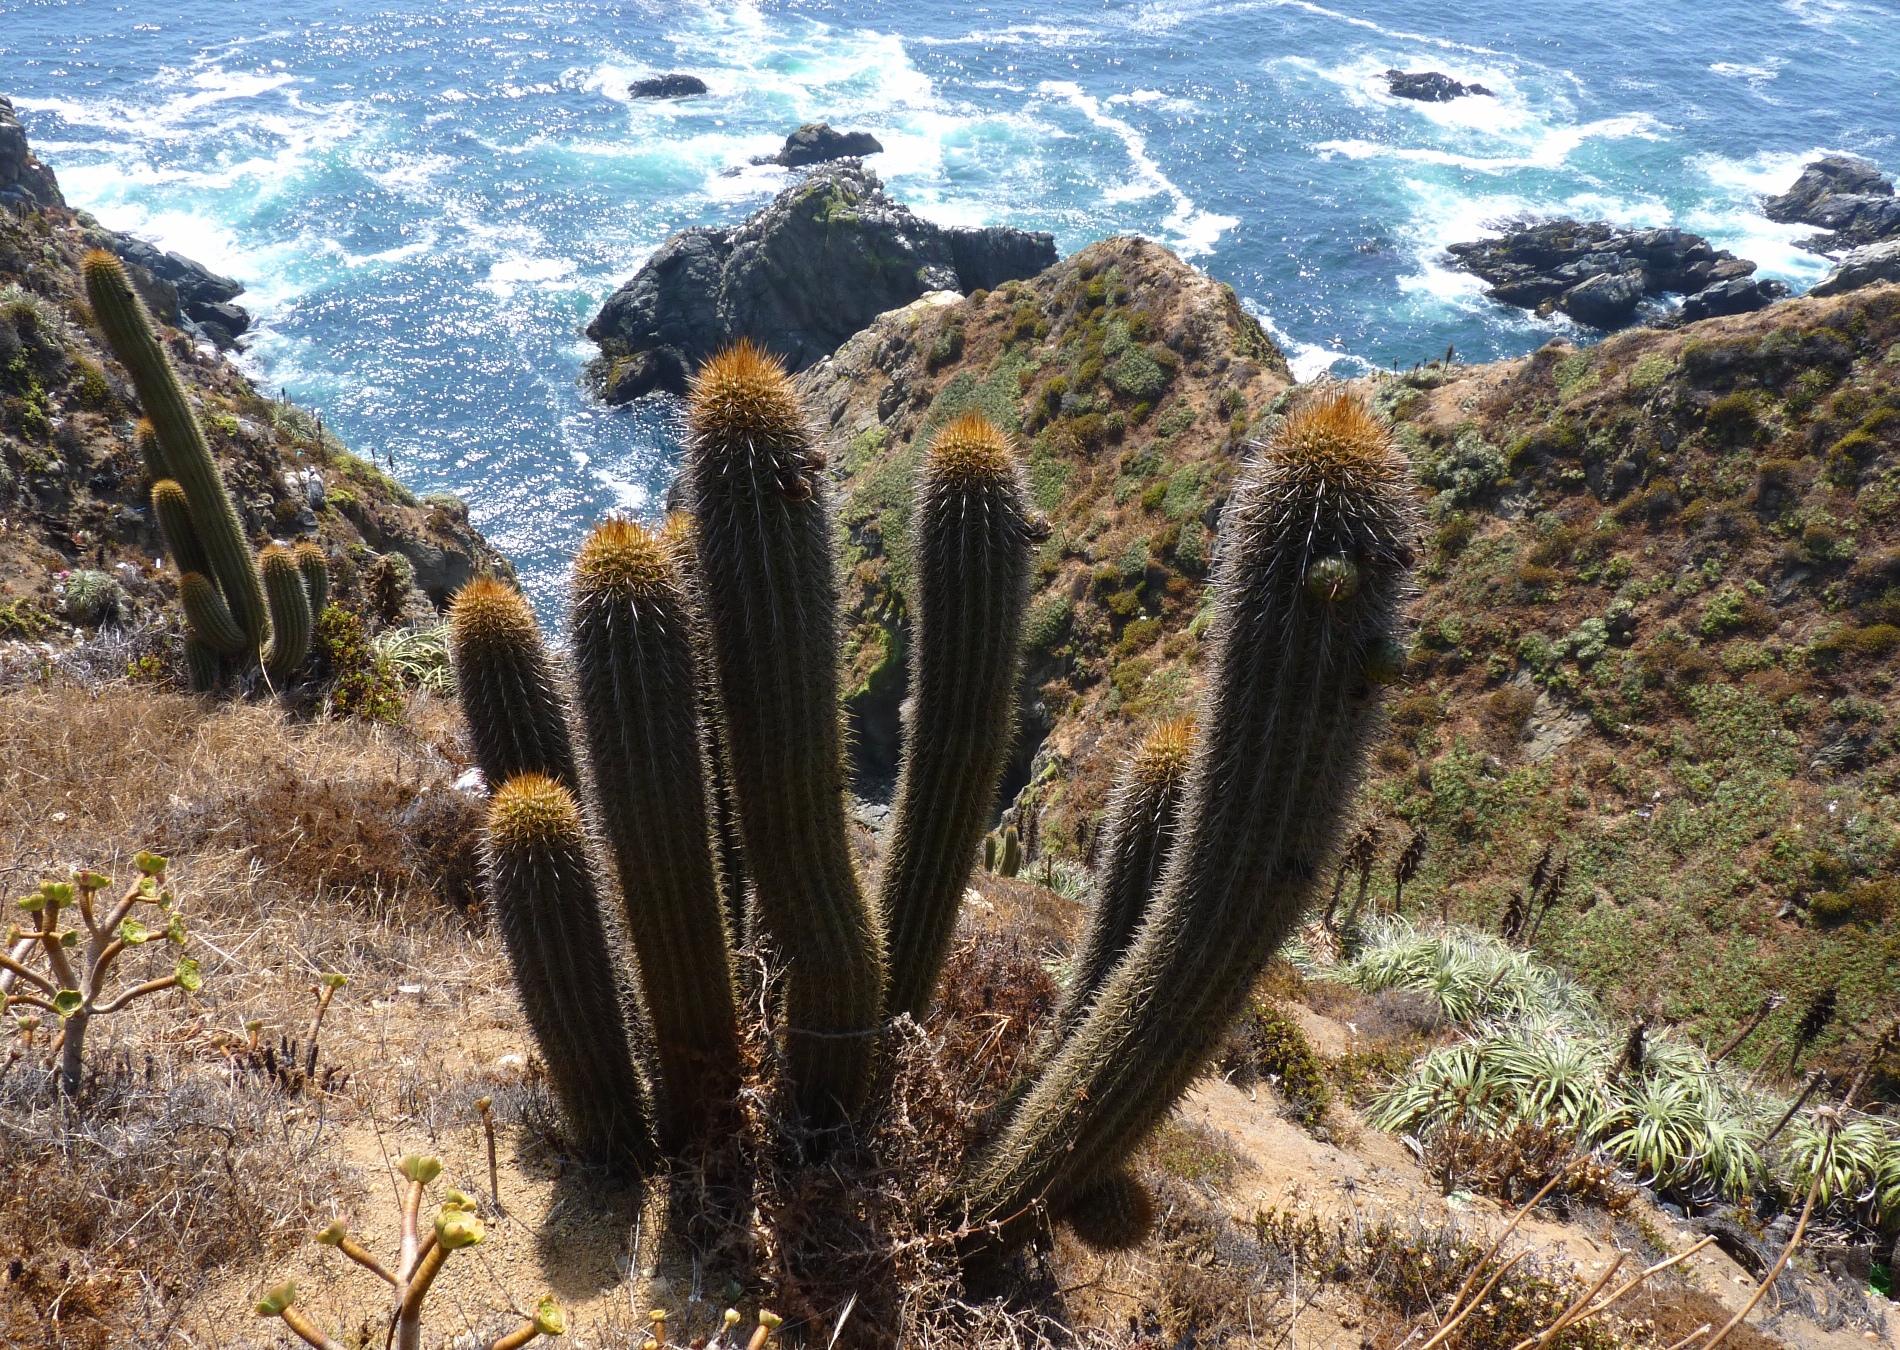 Trichocereus litoralis Echinopsis chiloensis ssp. litoralis 76